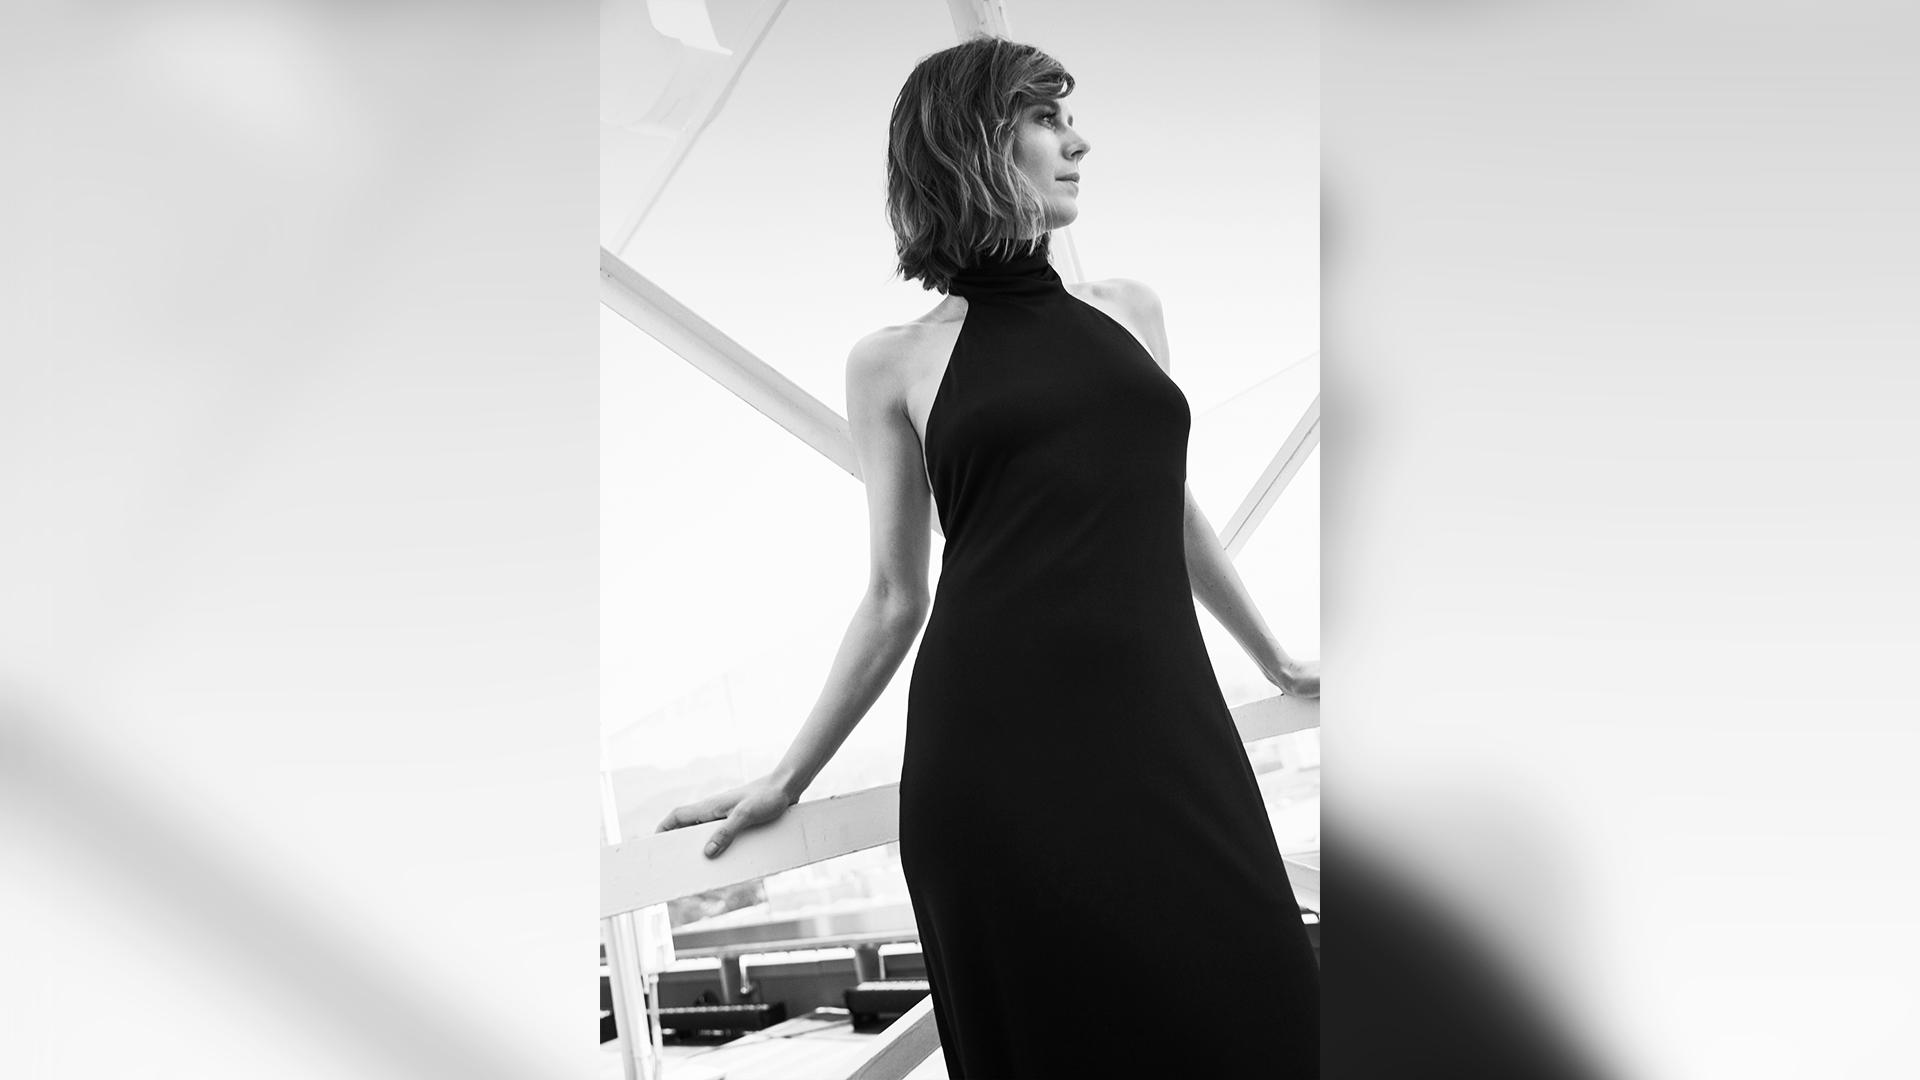 Katja Herbers hits new heights